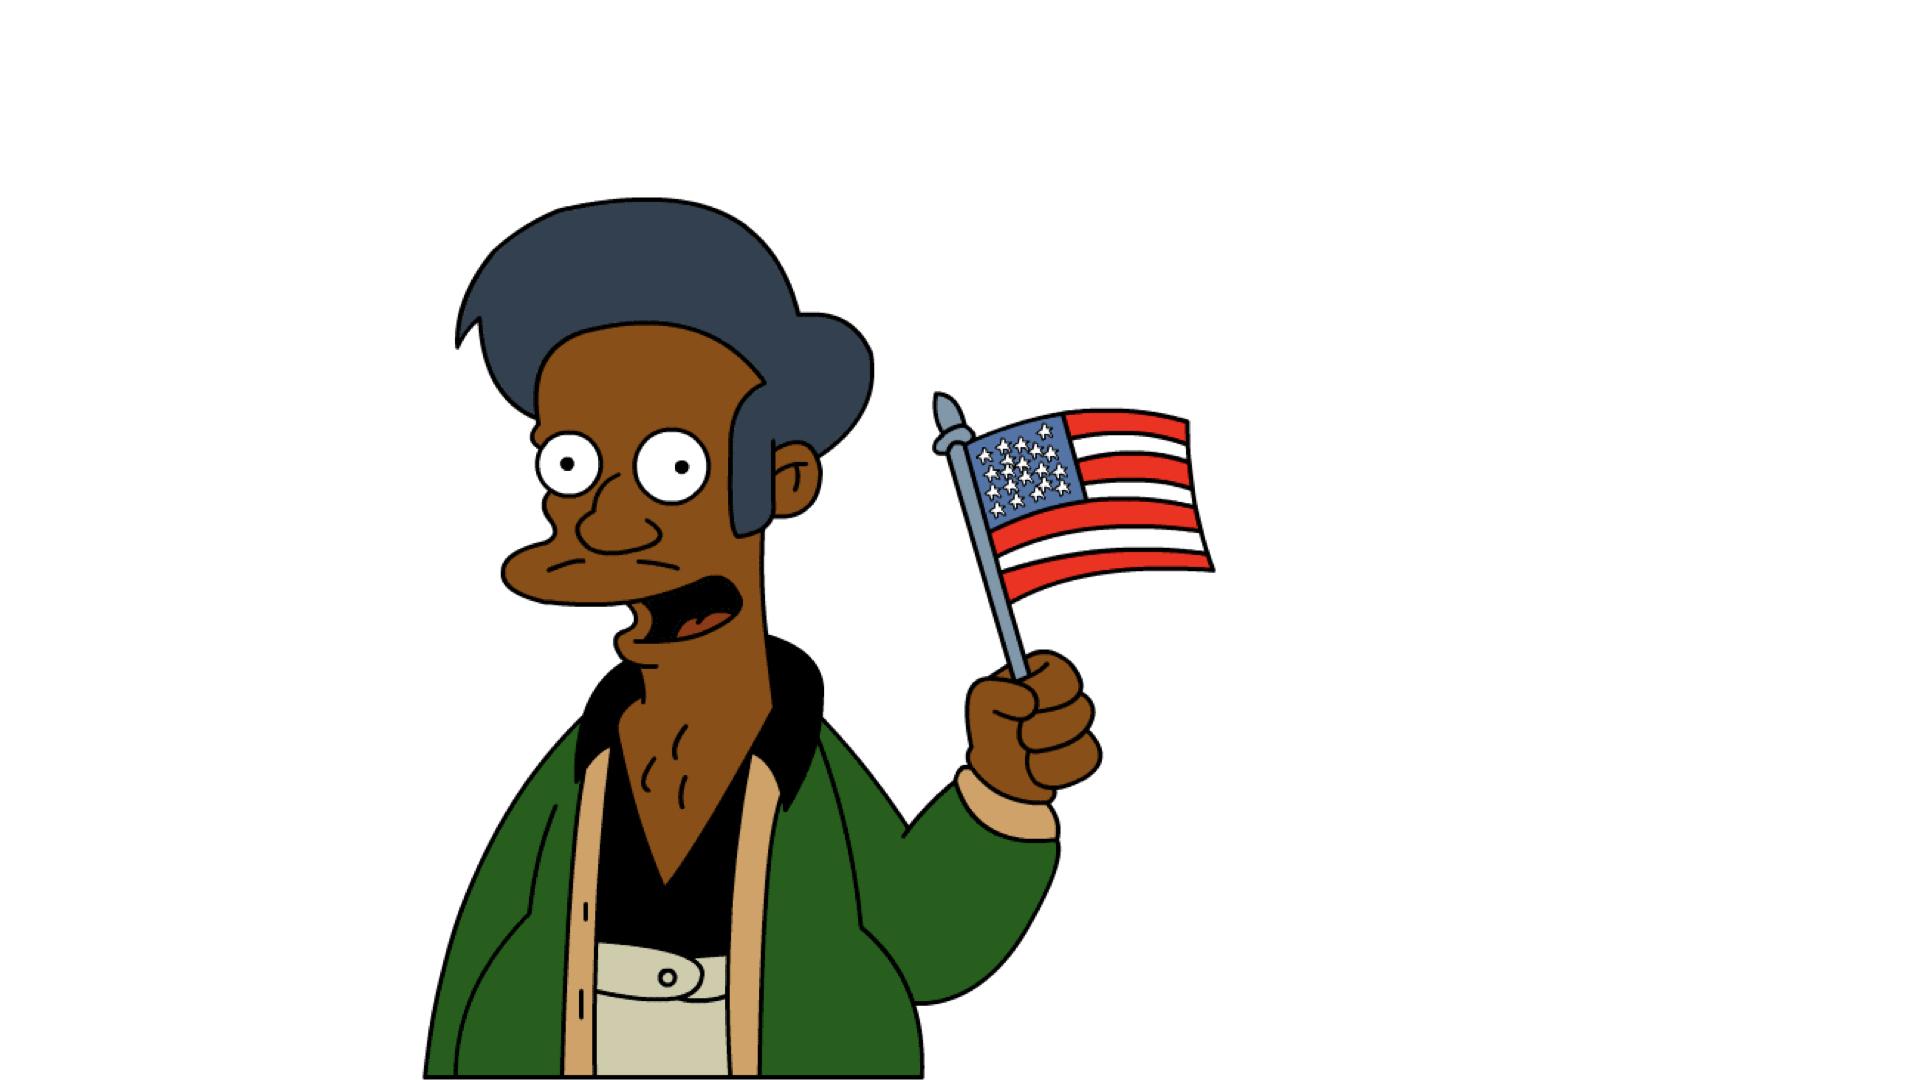 The Simpsons -APU